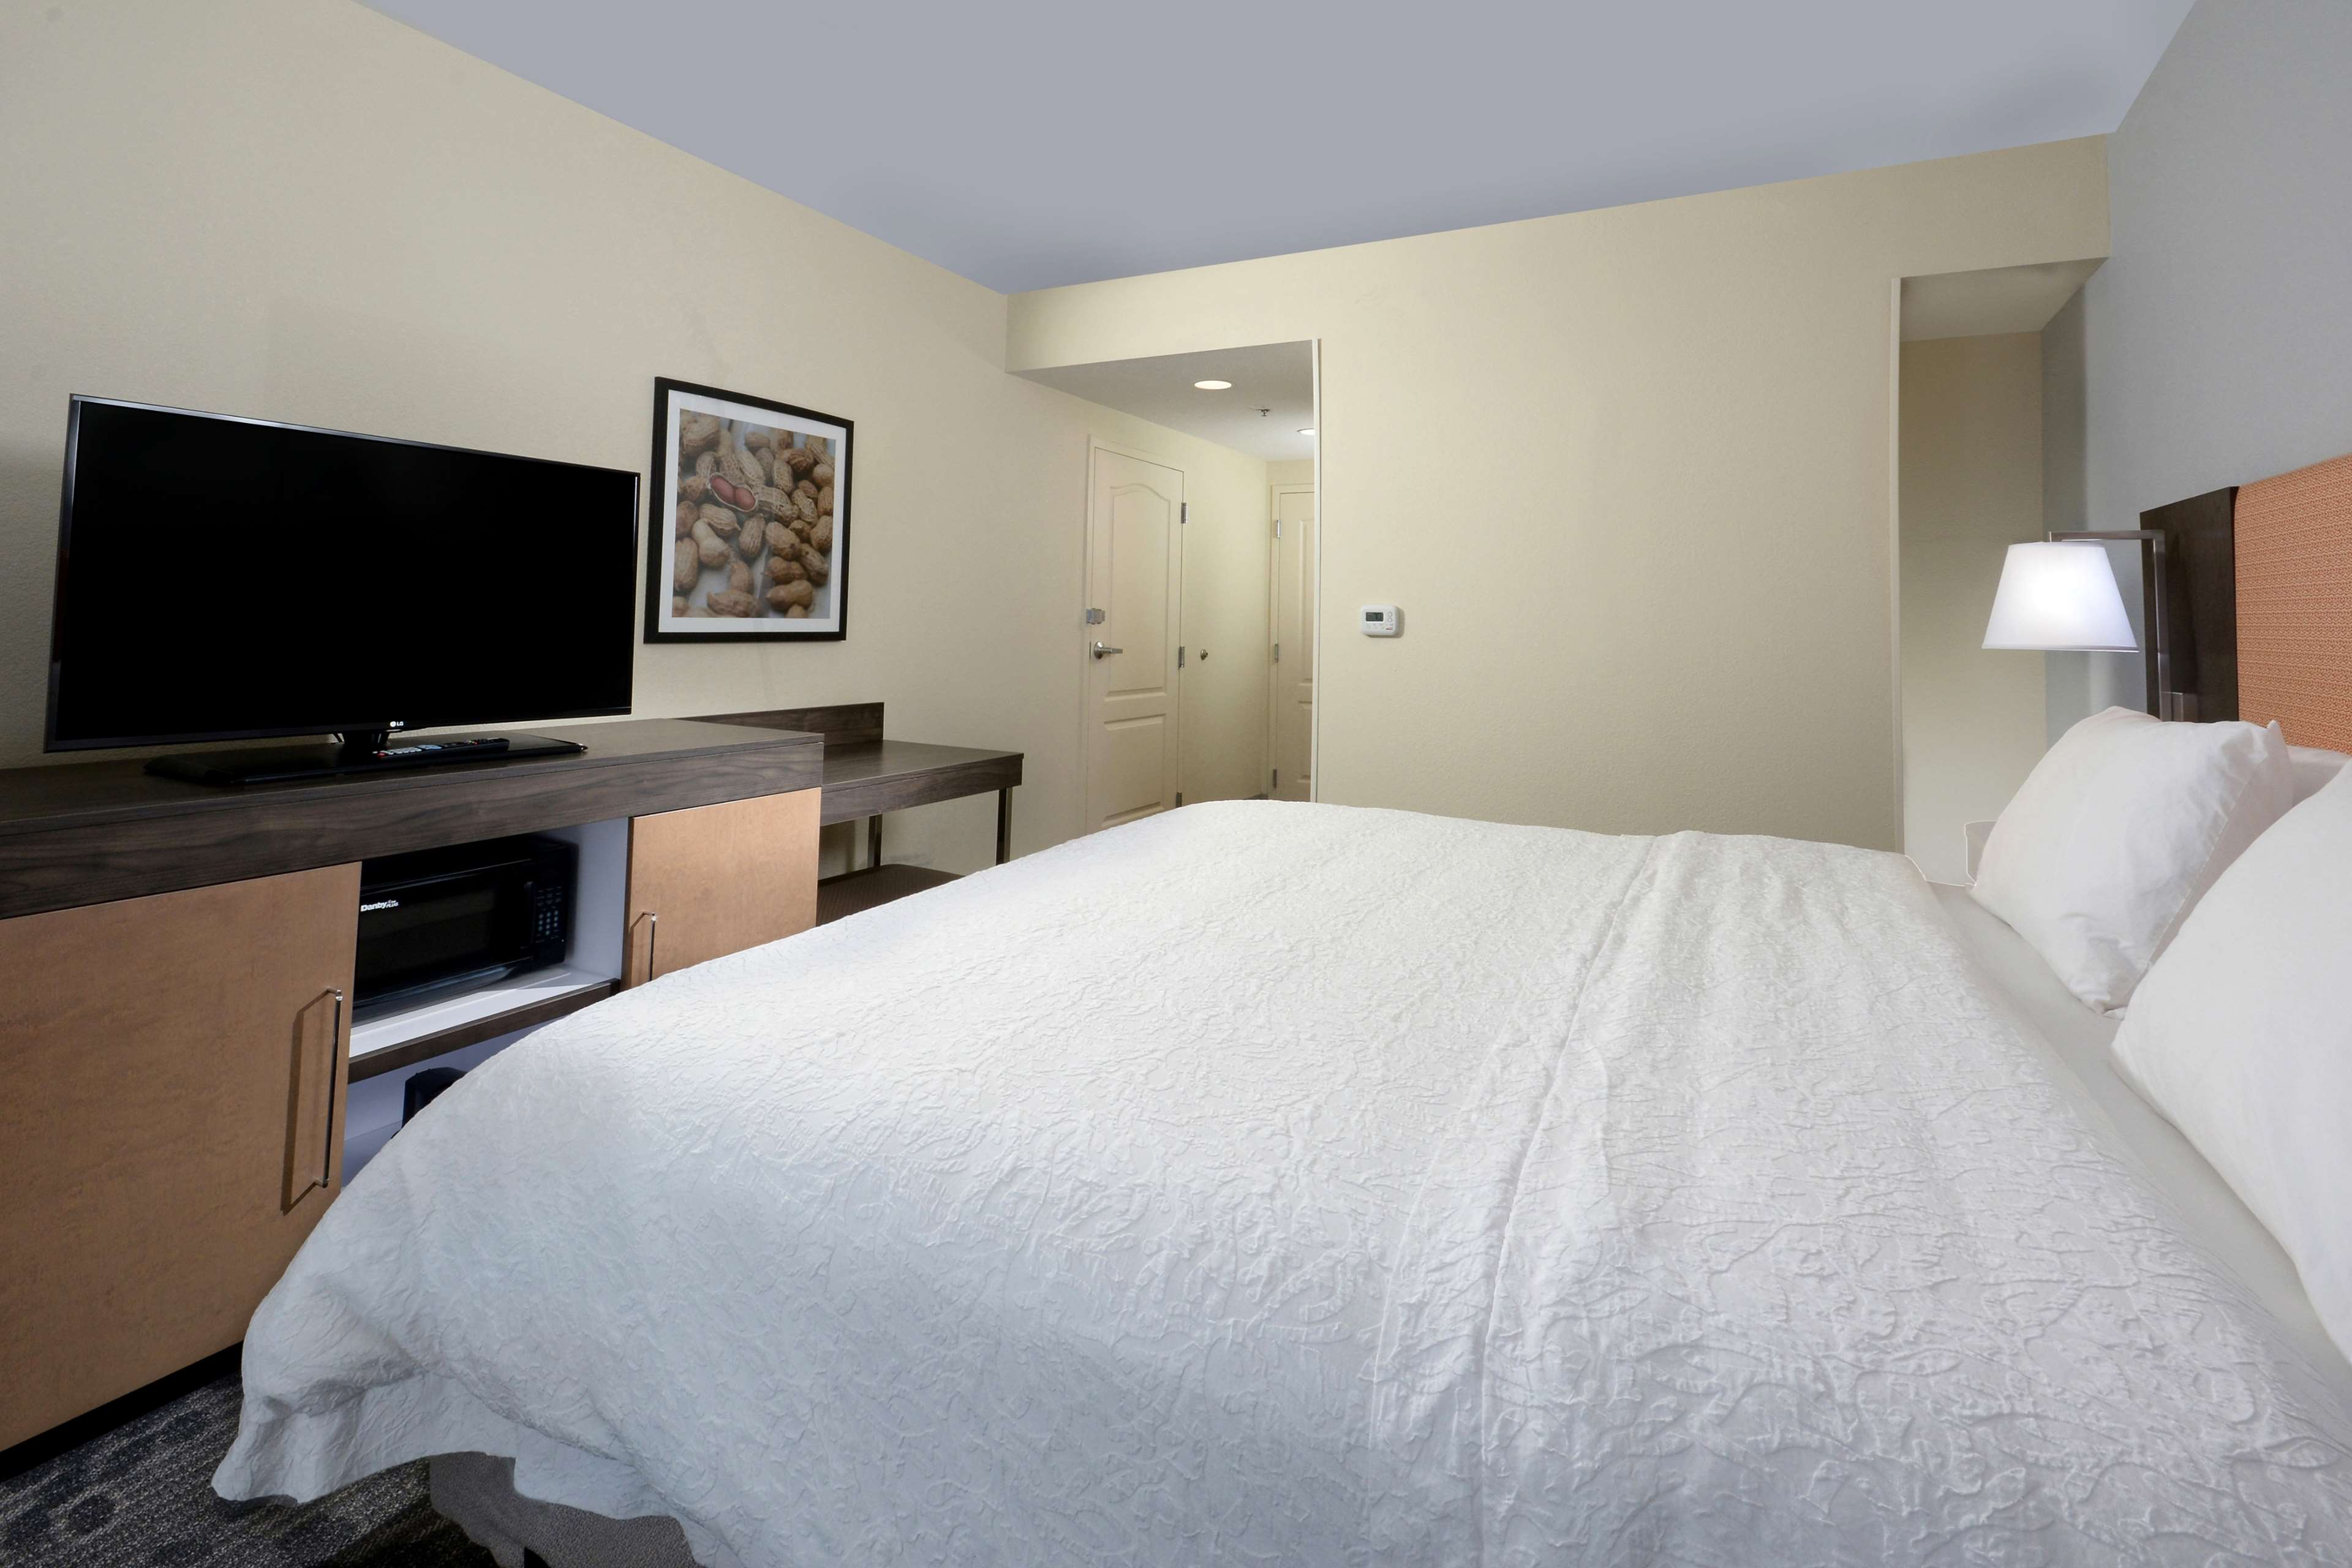 Hampton Inn & Suites Greenville/Spartanburg I-85 image 41